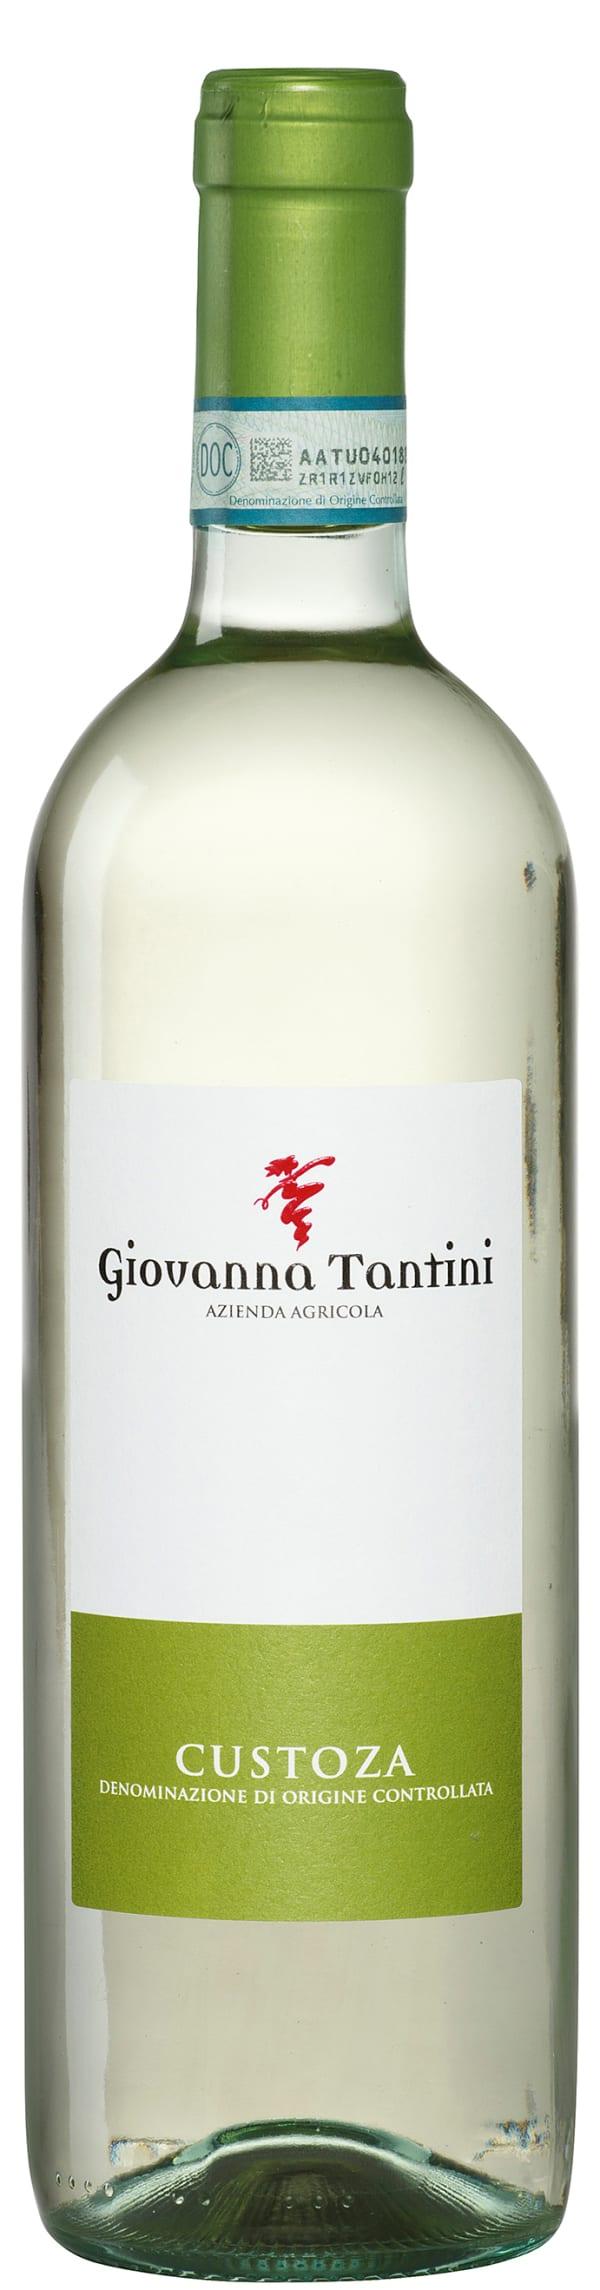 Giovanna Tantini Bianco 2019